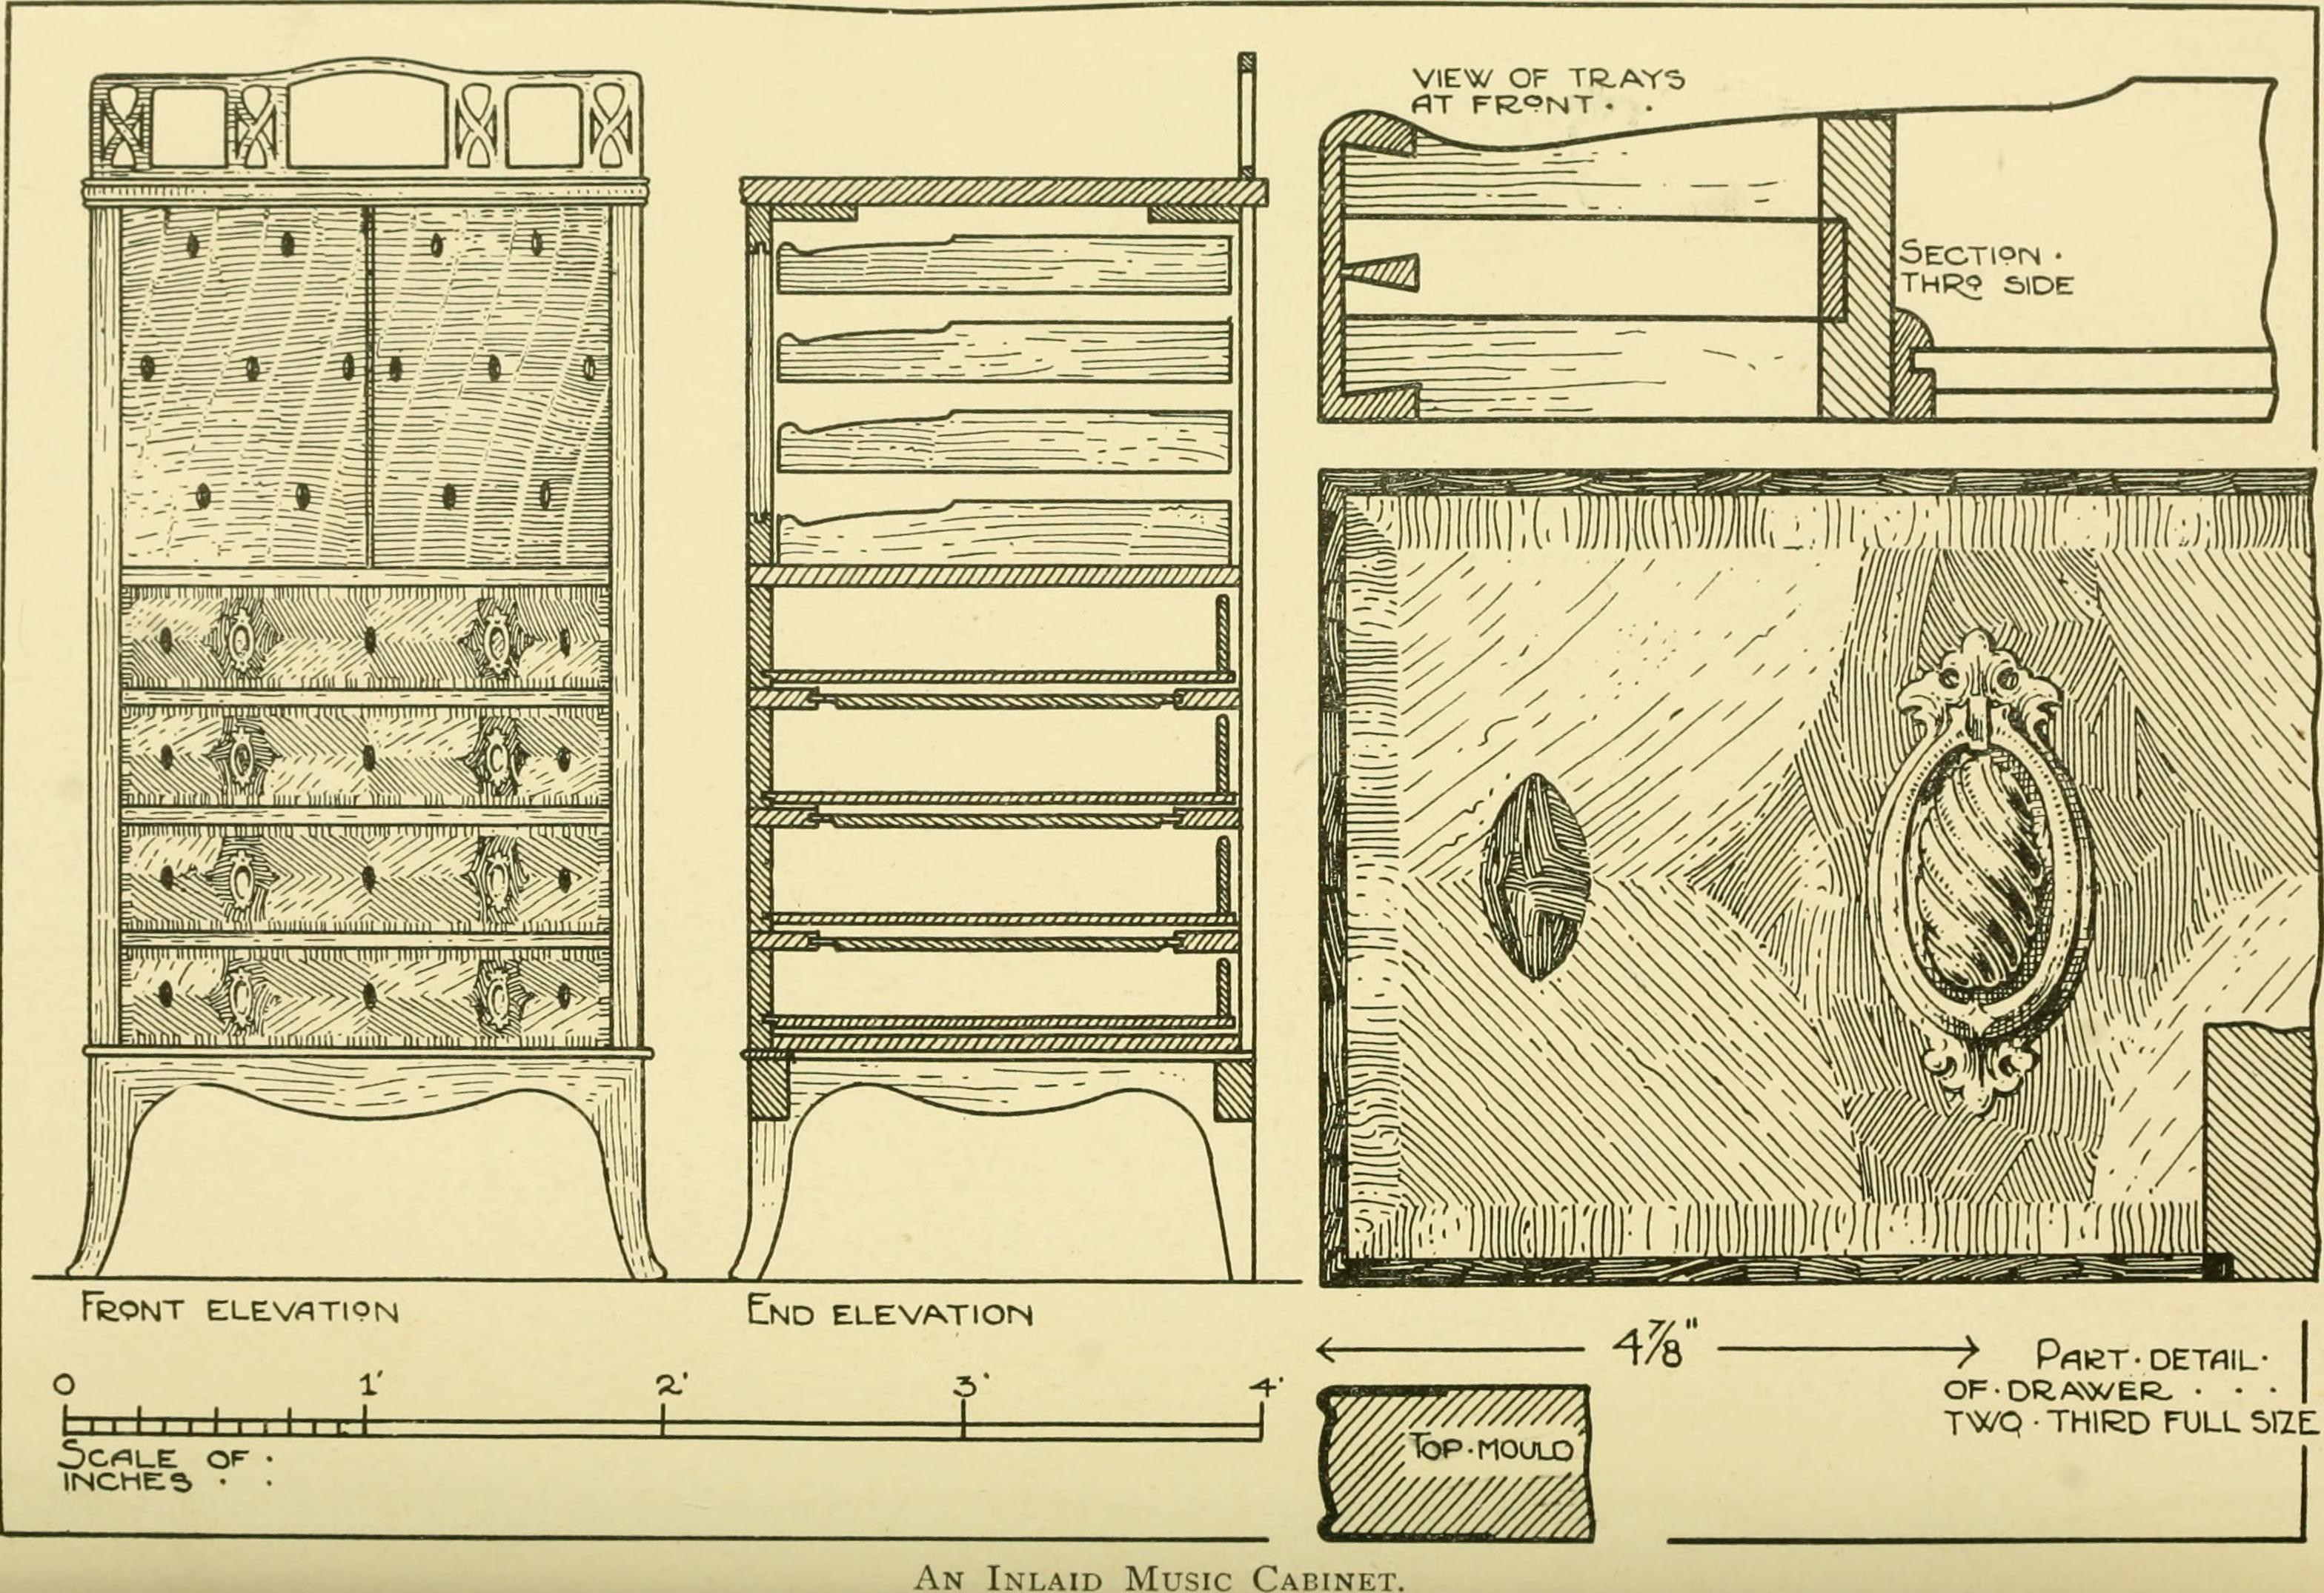 cabinetwork